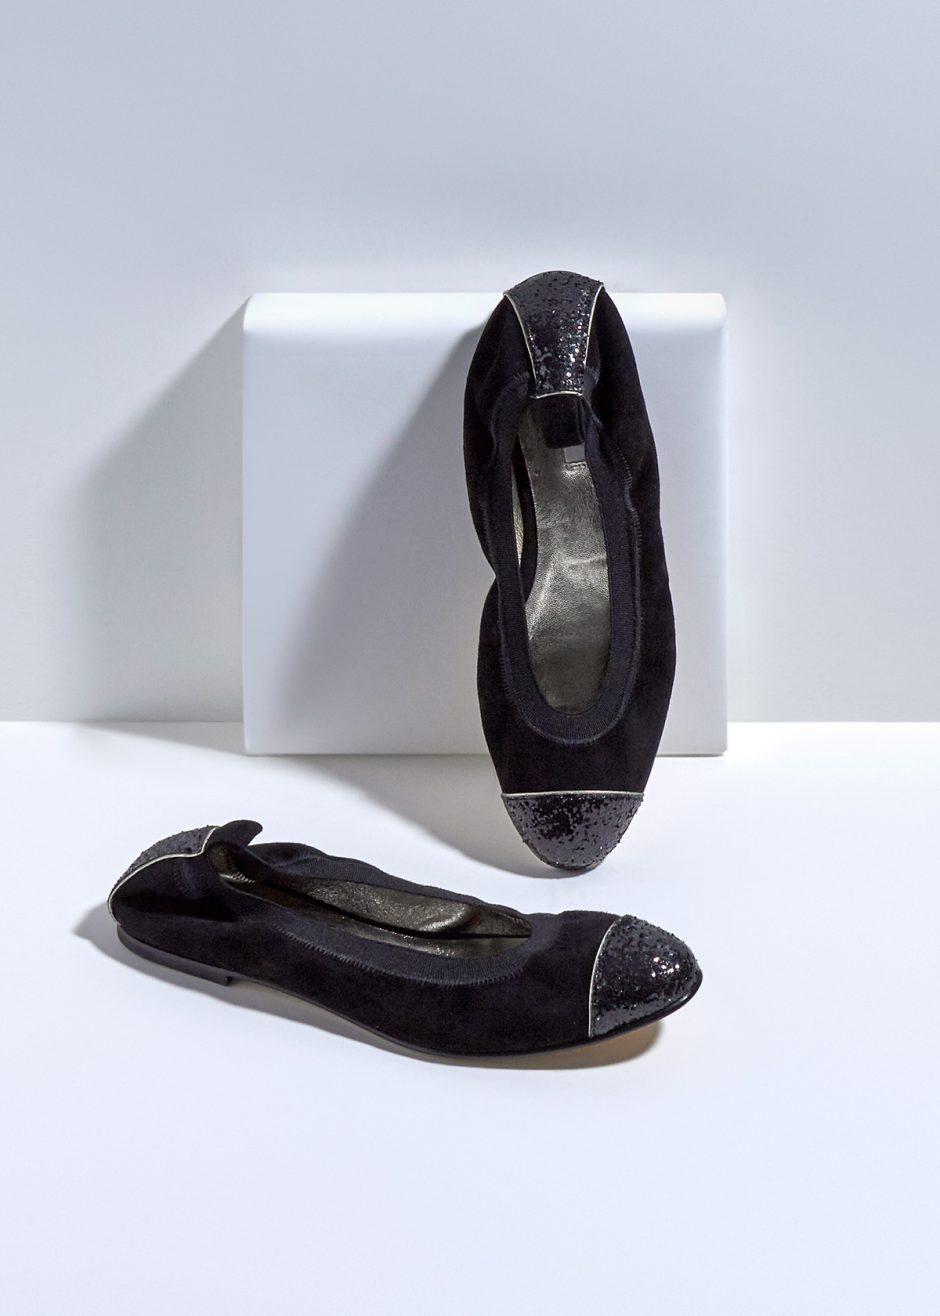 Kate – Ballet flat black kidskin suede with black glitter toe cap and heel